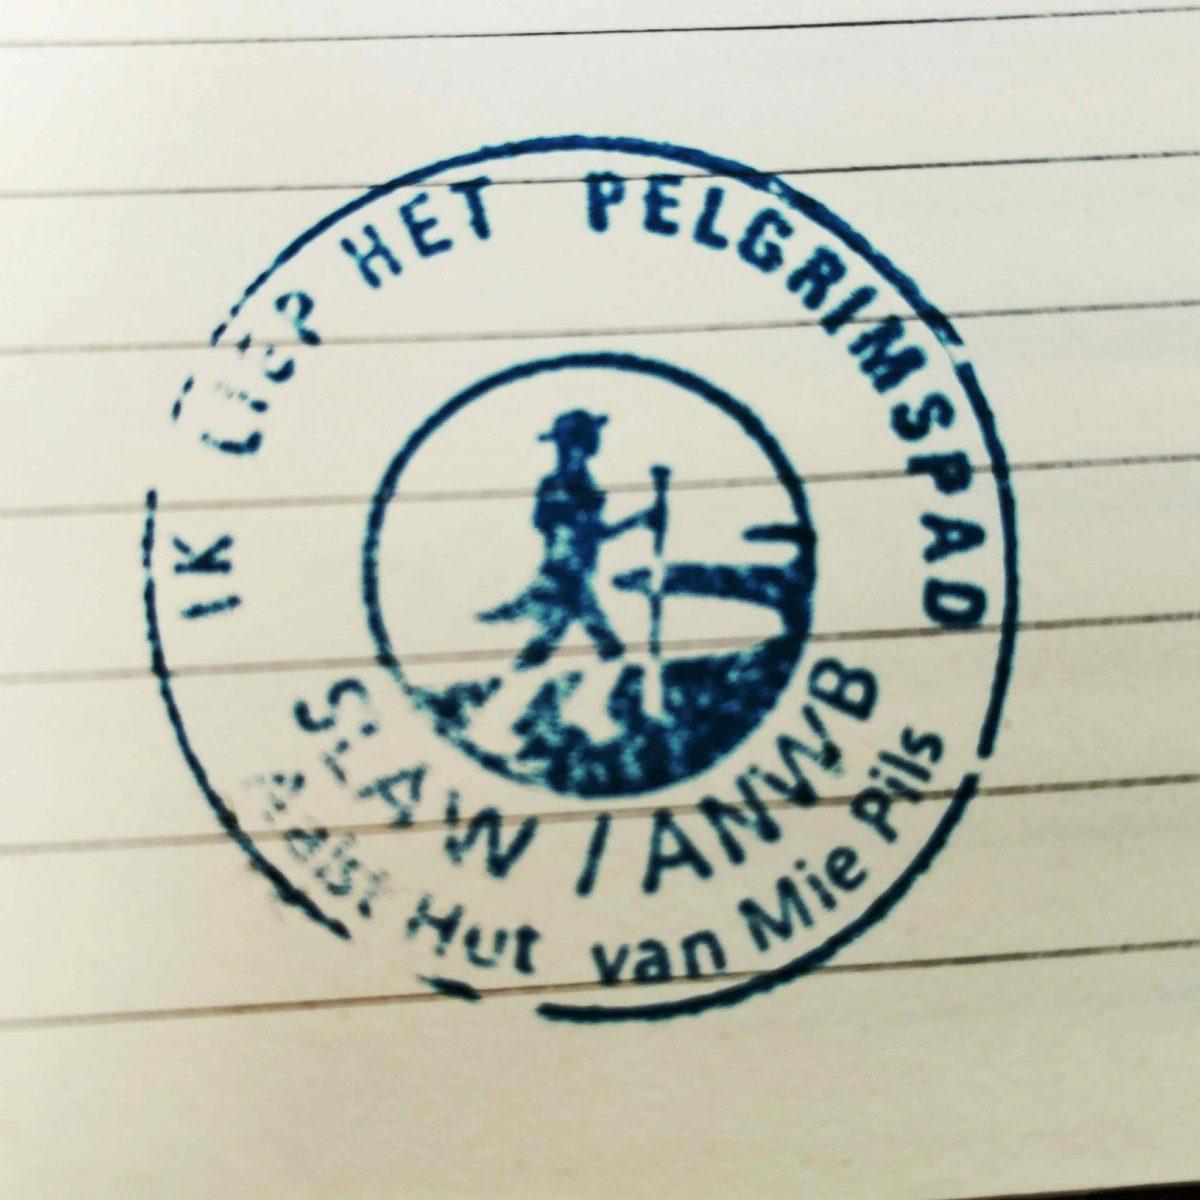 Pelgrimspad_nederland